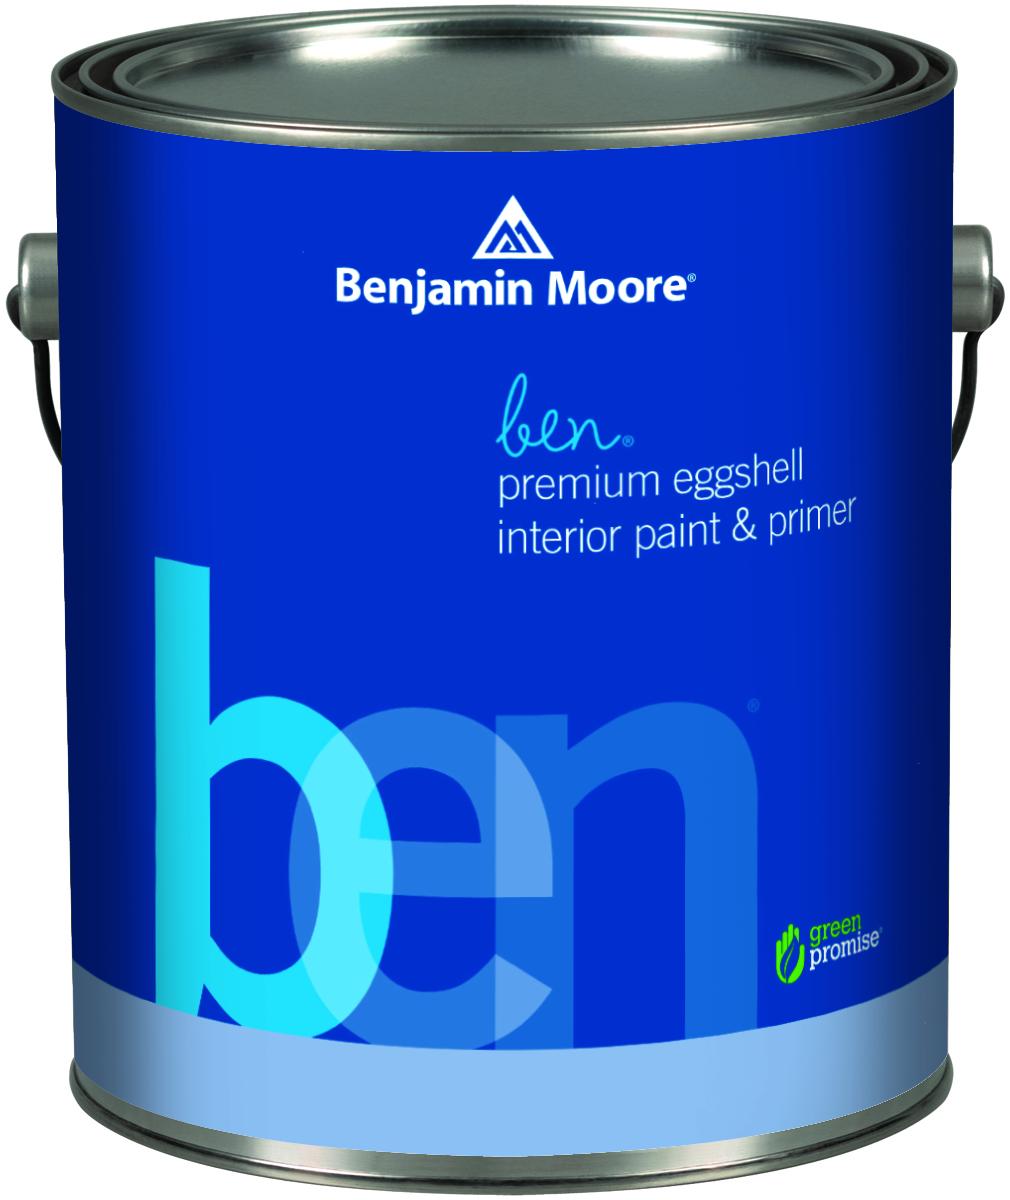 Benjamin Moore Paint Wm Dyck Sons